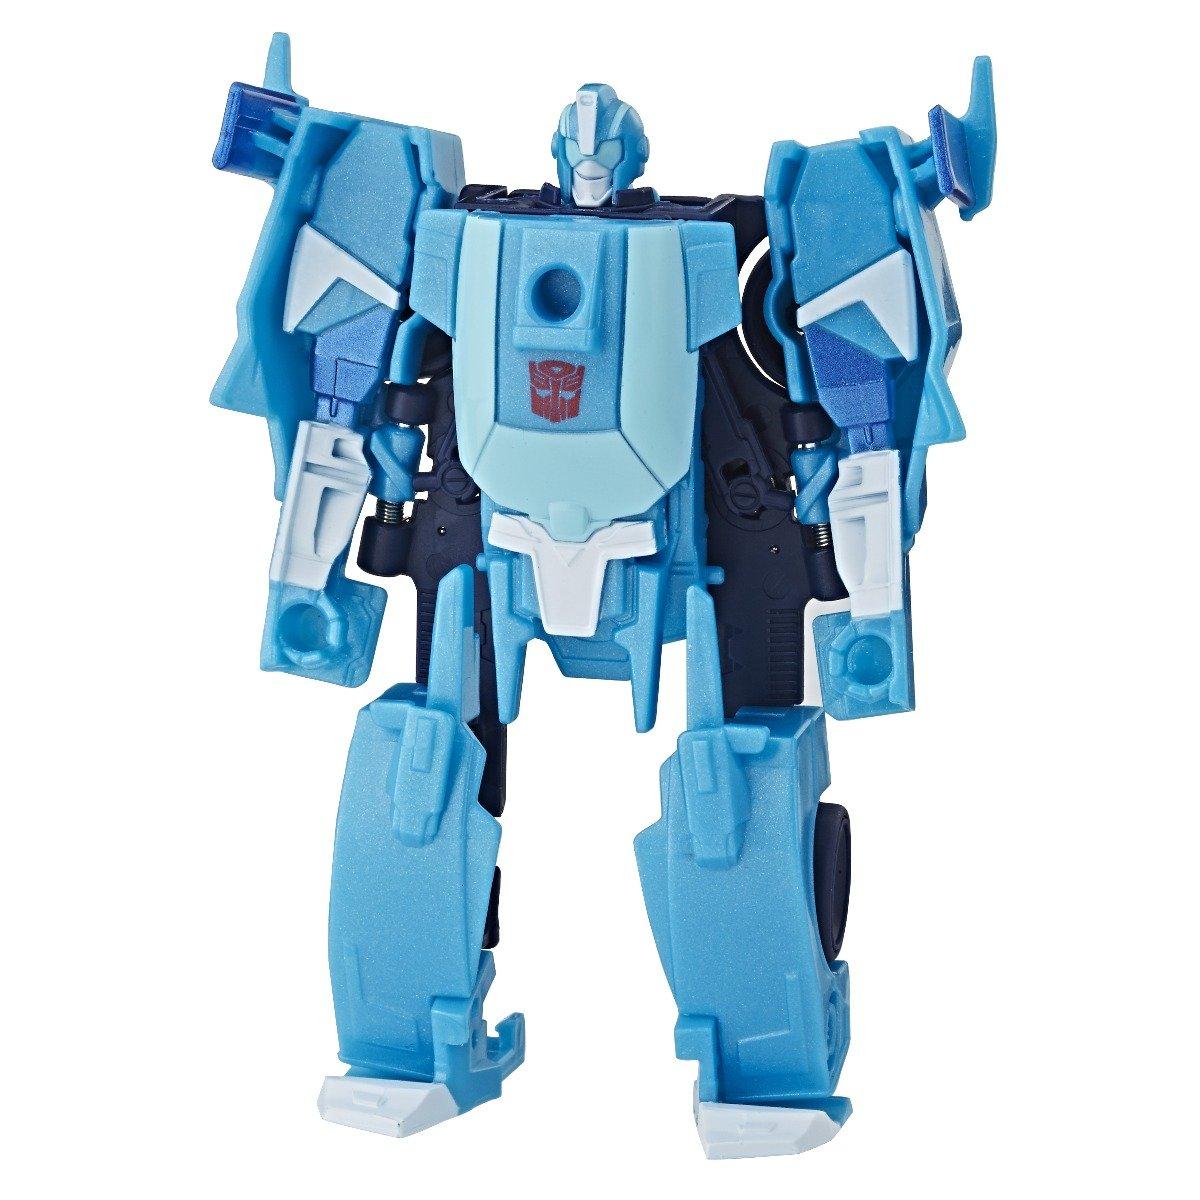 Figurina Transformers Cyberverse Step Charger Blurr